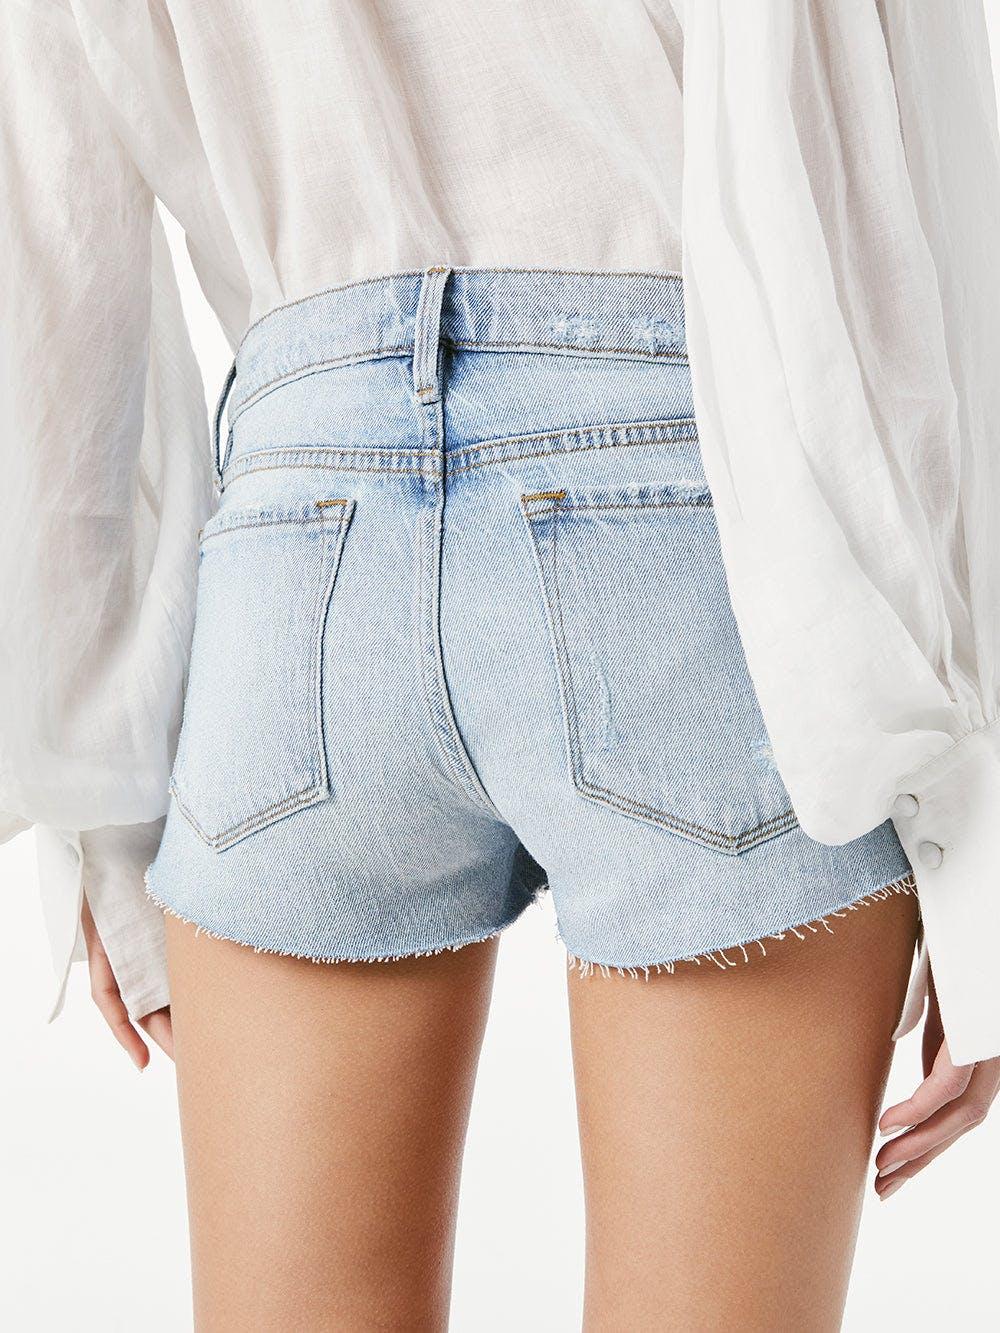 shorts detail view 2